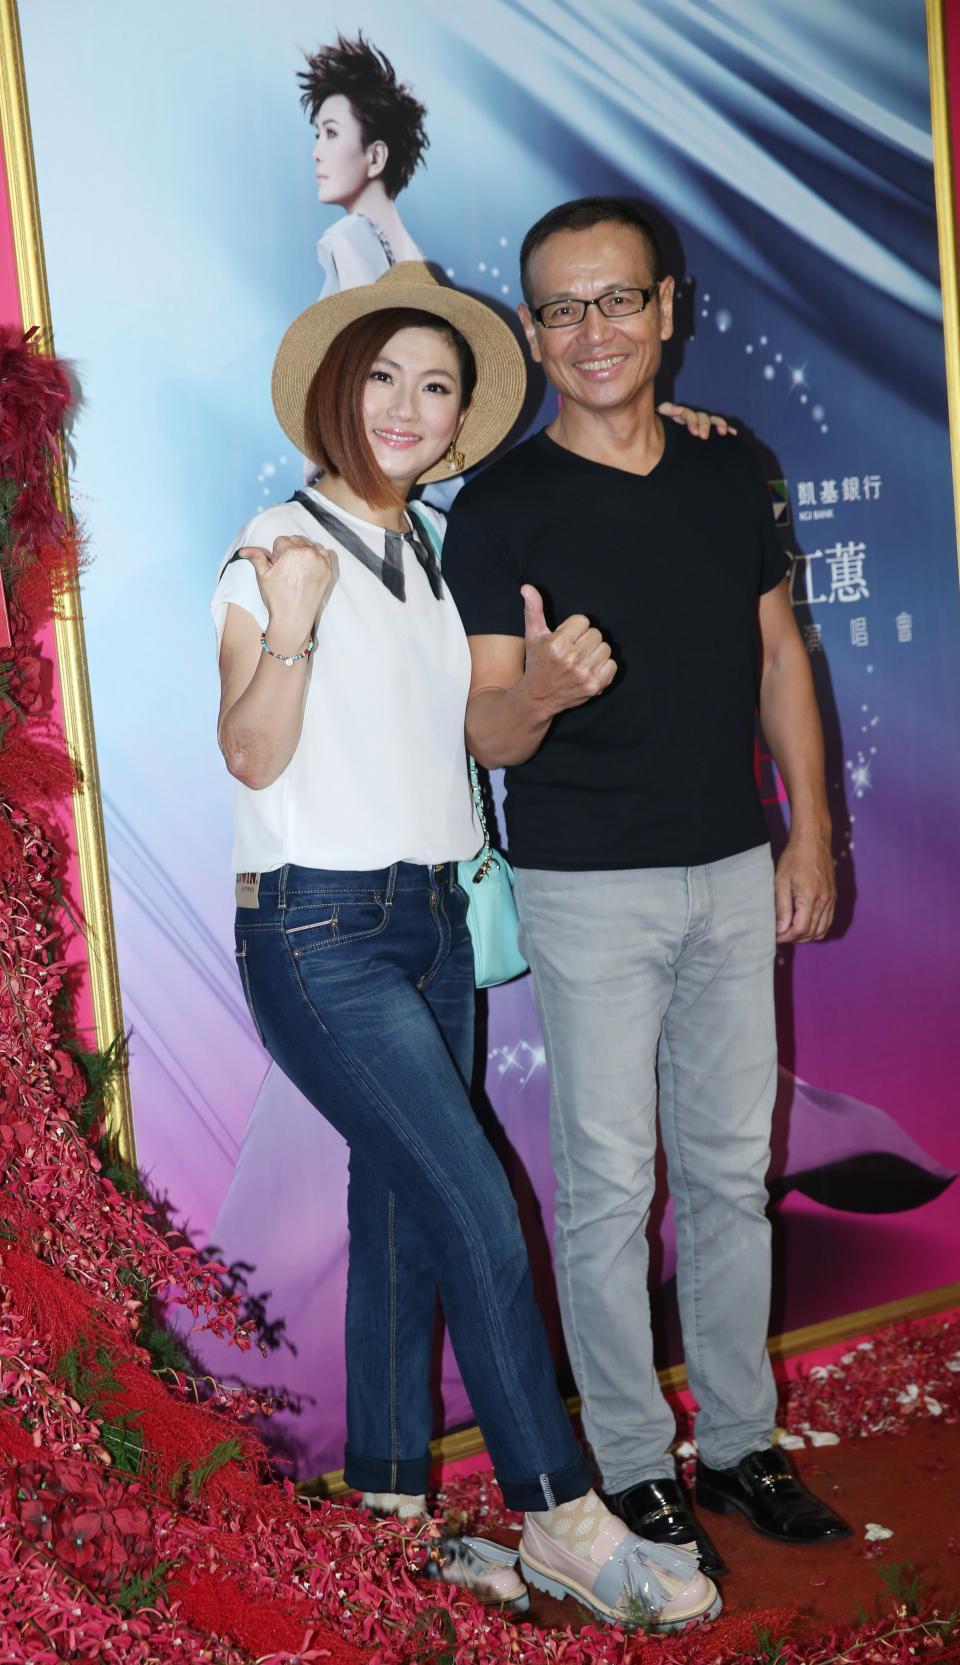 Selina(左)及任爸。本報系資料照 記者陳瑞源/攝影